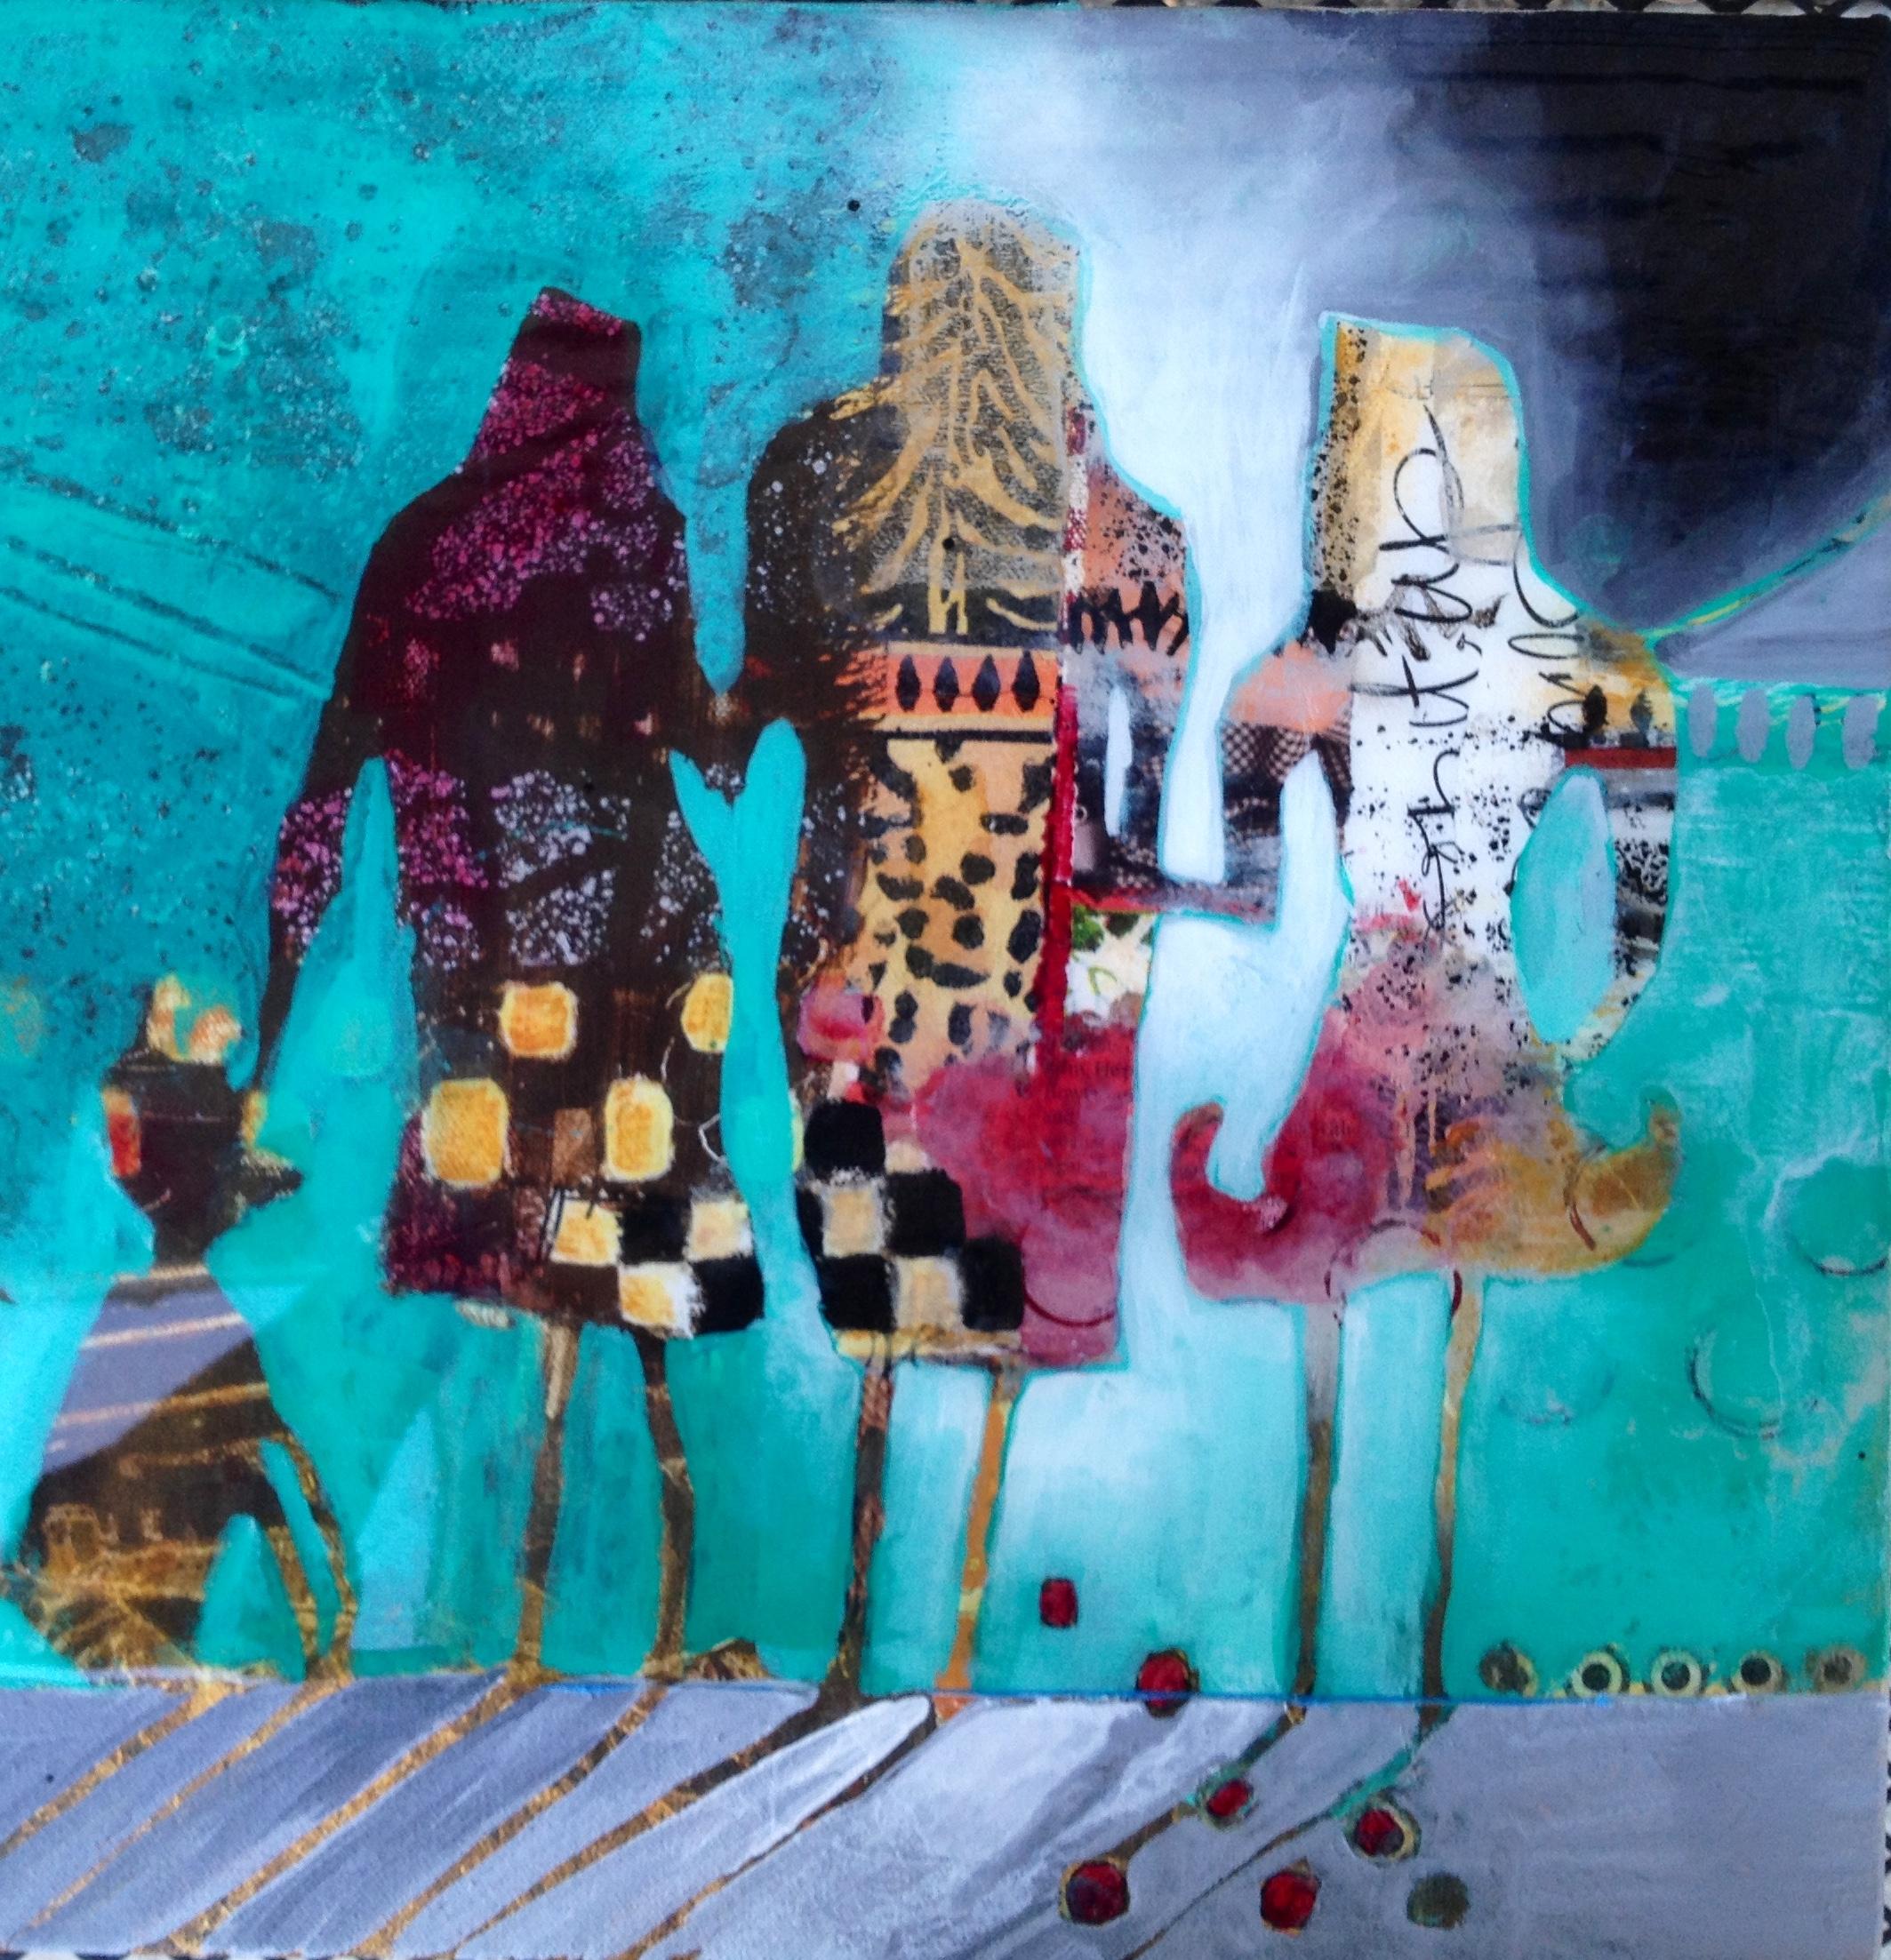 Acrylic and collage on canvas. Epoxy coated. SOLD by Jennifer Stone at Jennifer Stone Artwork